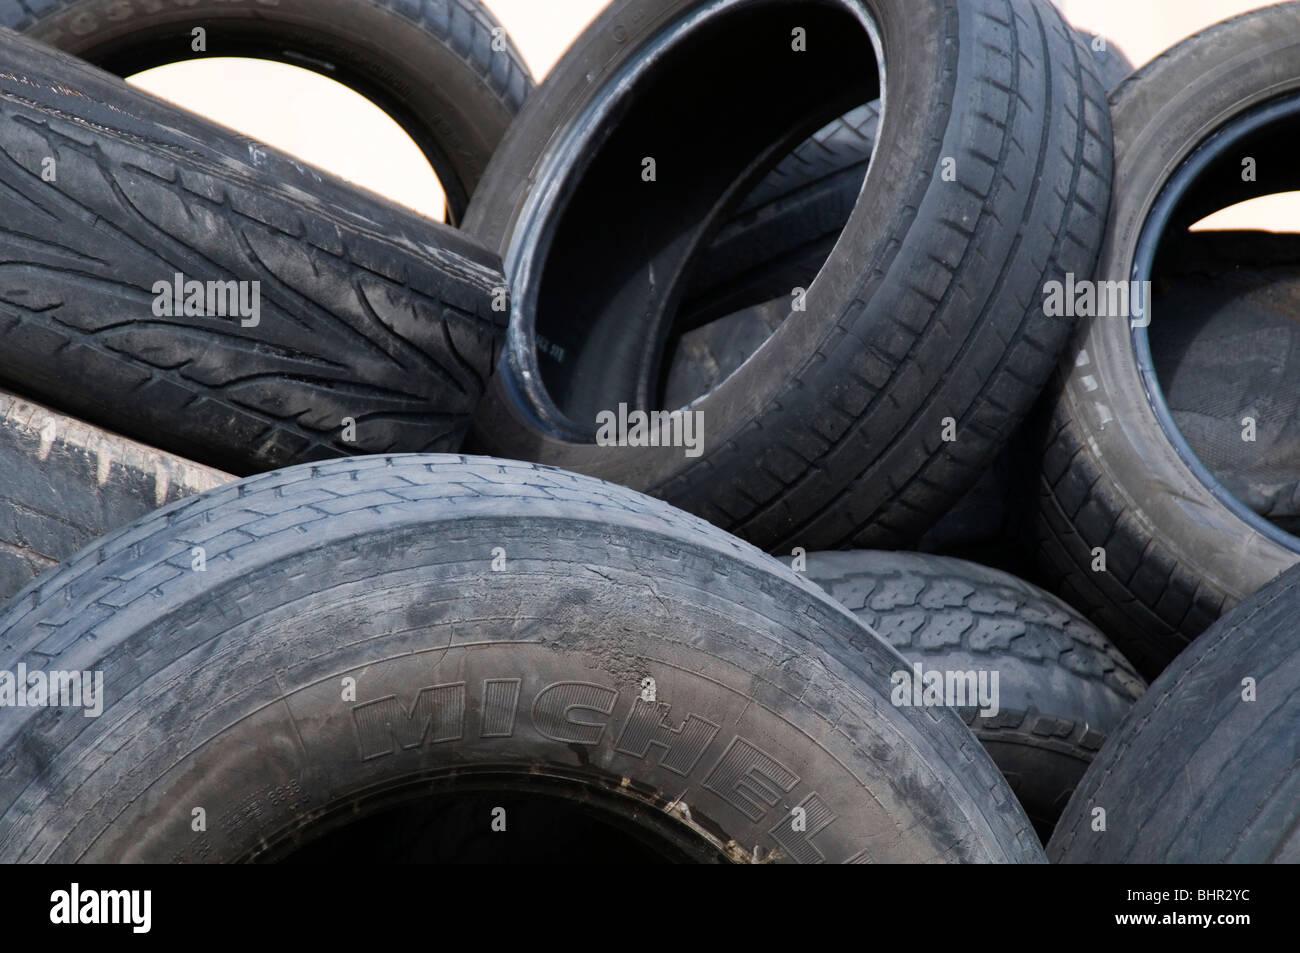 Buy Car Tyres Uk